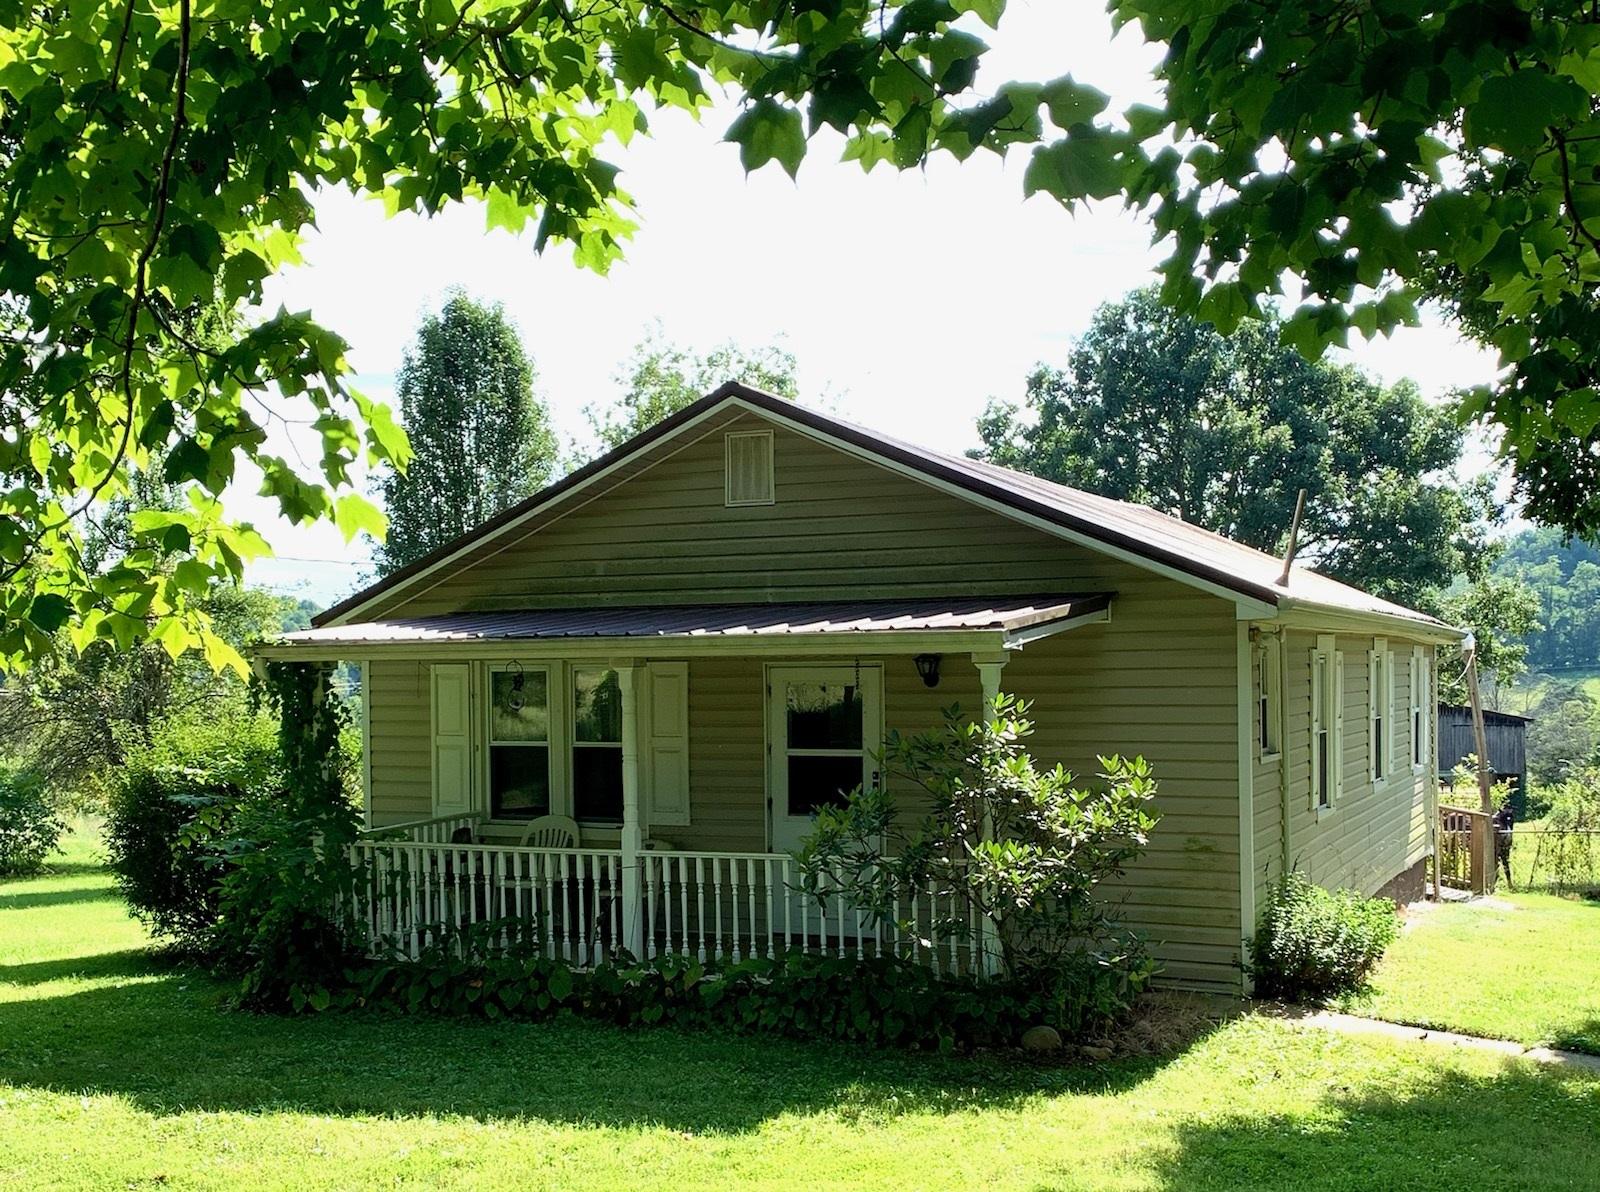 Estate AuctionThe Clarence  Frances Pitt EstateSaturday September 25 2021 at 10AMApprox 3